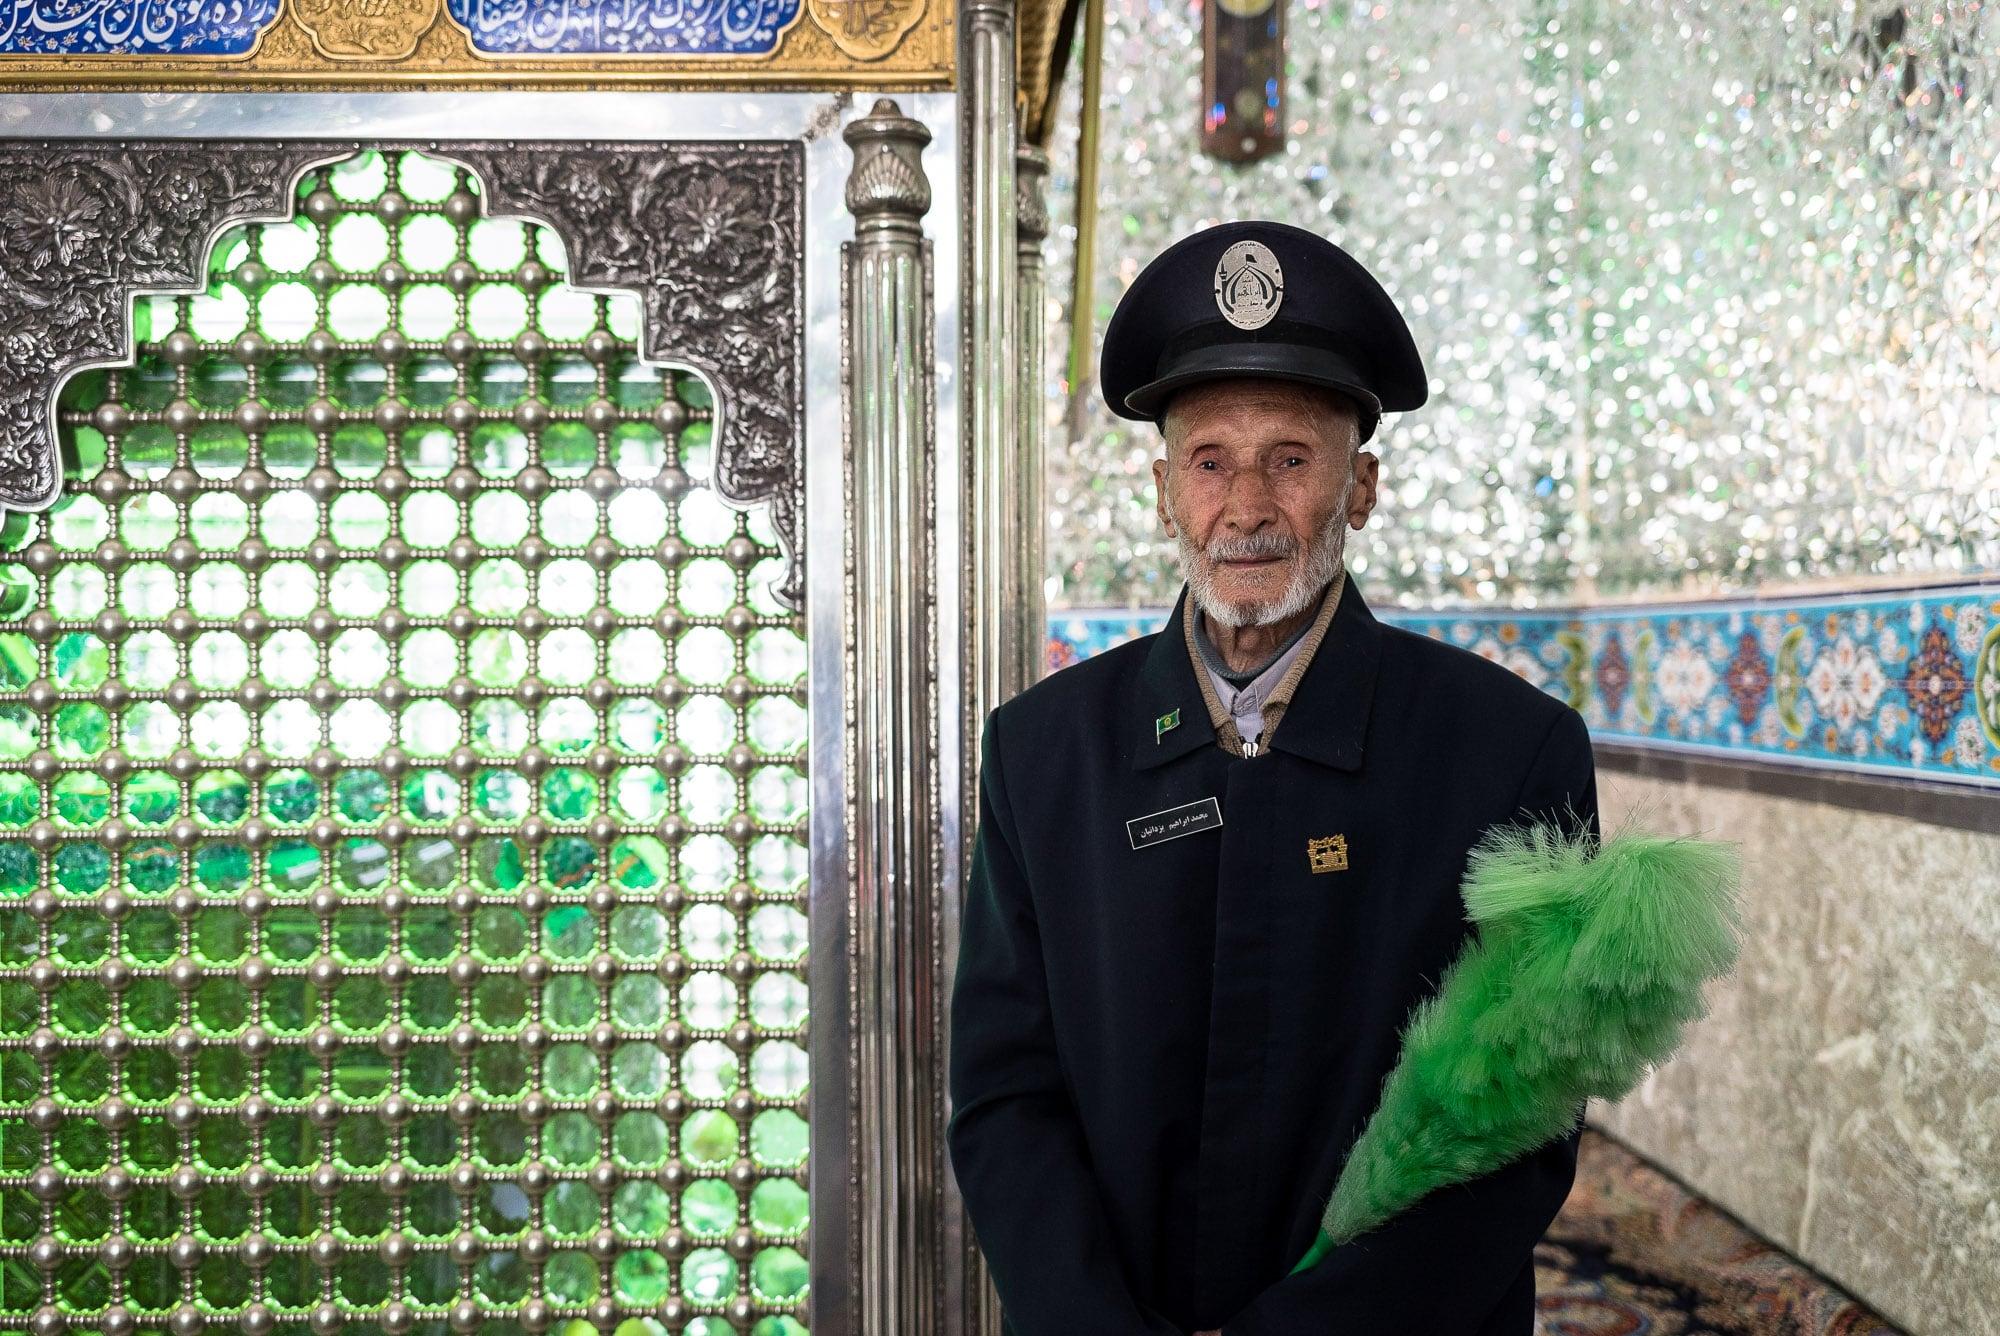 shrine guard